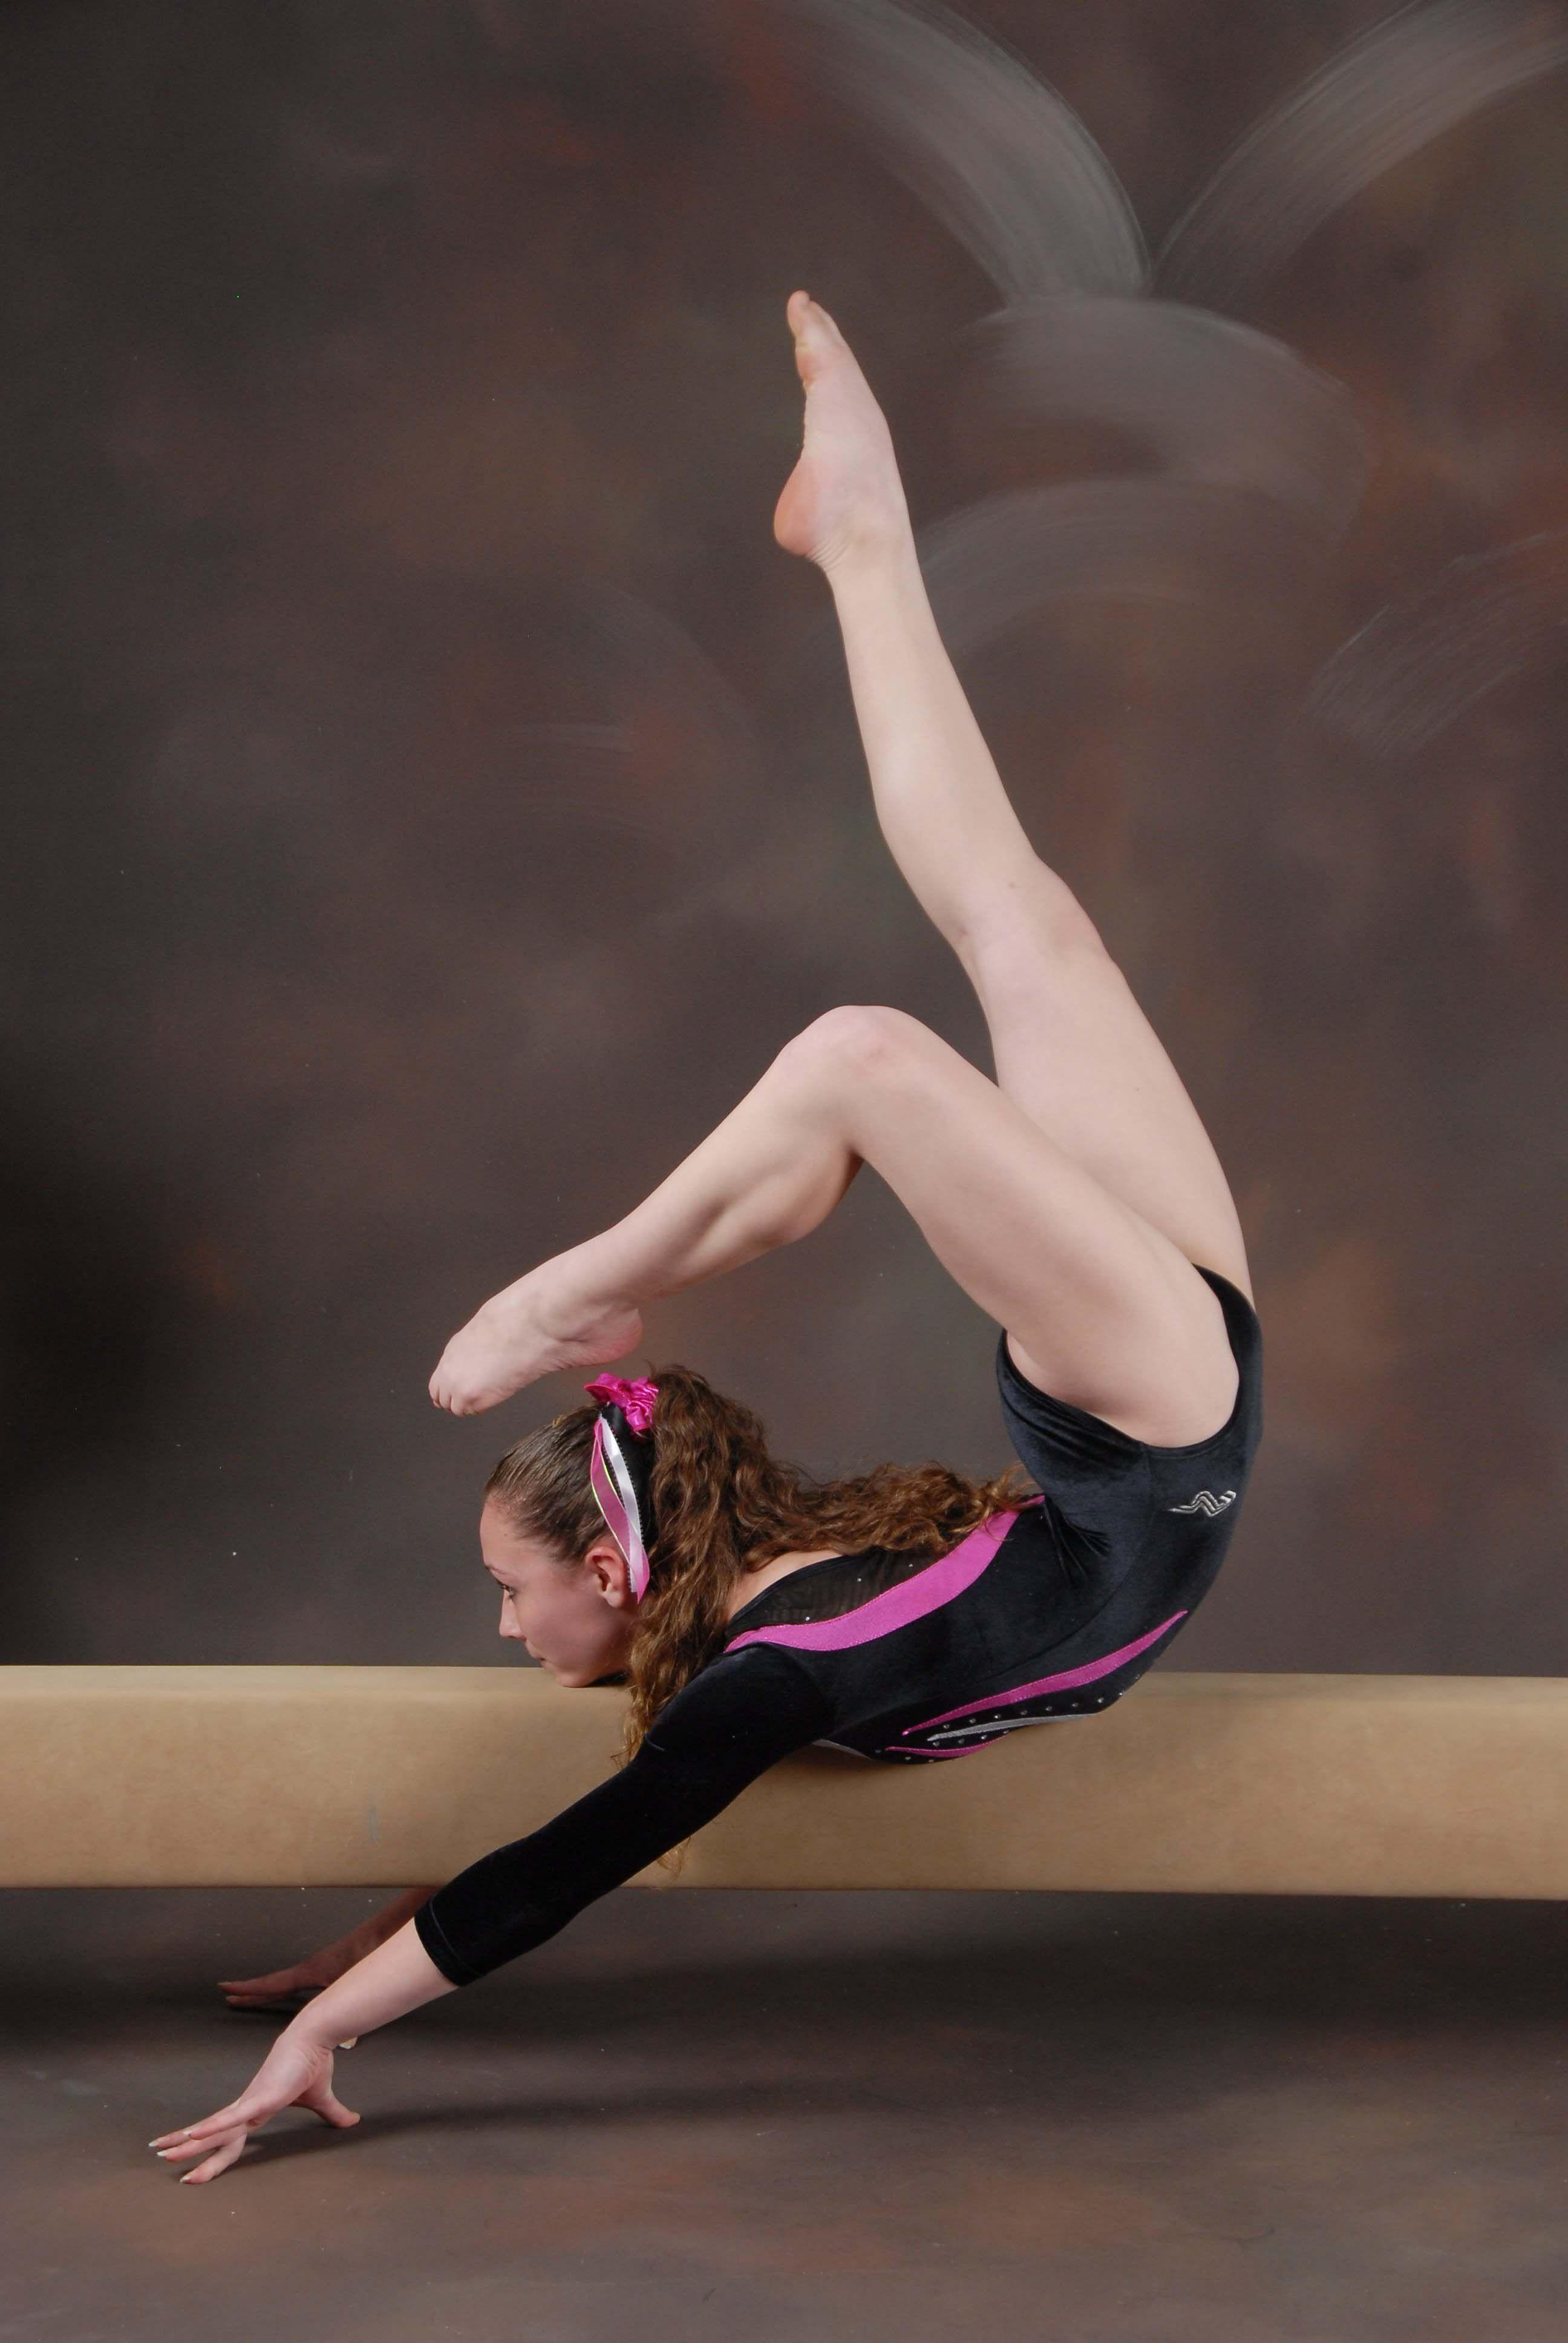 Tatiana Lysenko 3 Olympic medals in gymnastics Tatiana Lysenko 3 Olympic medals in gymnastics new pictures